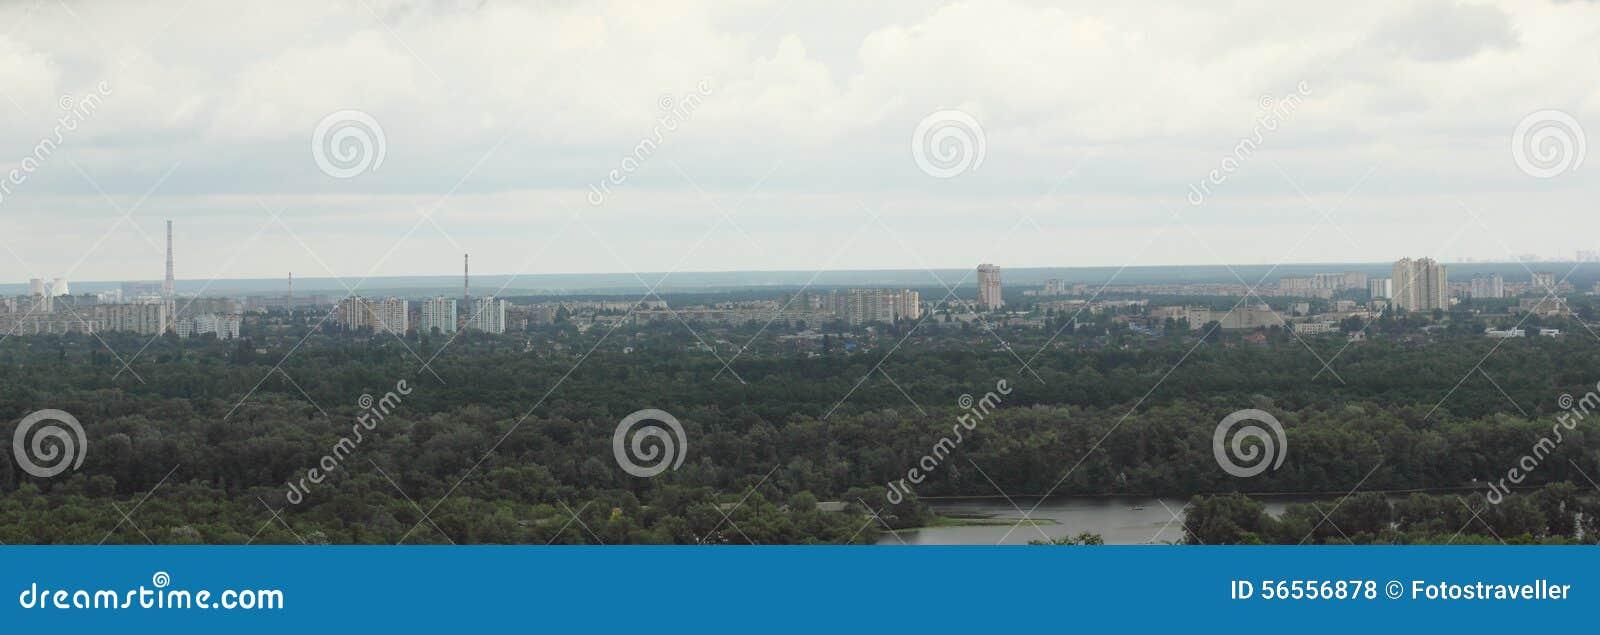 Download Πανόραμα της πόλης από το λόφο Στοκ Εικόνες - εικόνα από περιοχής, λόφος: 56556878